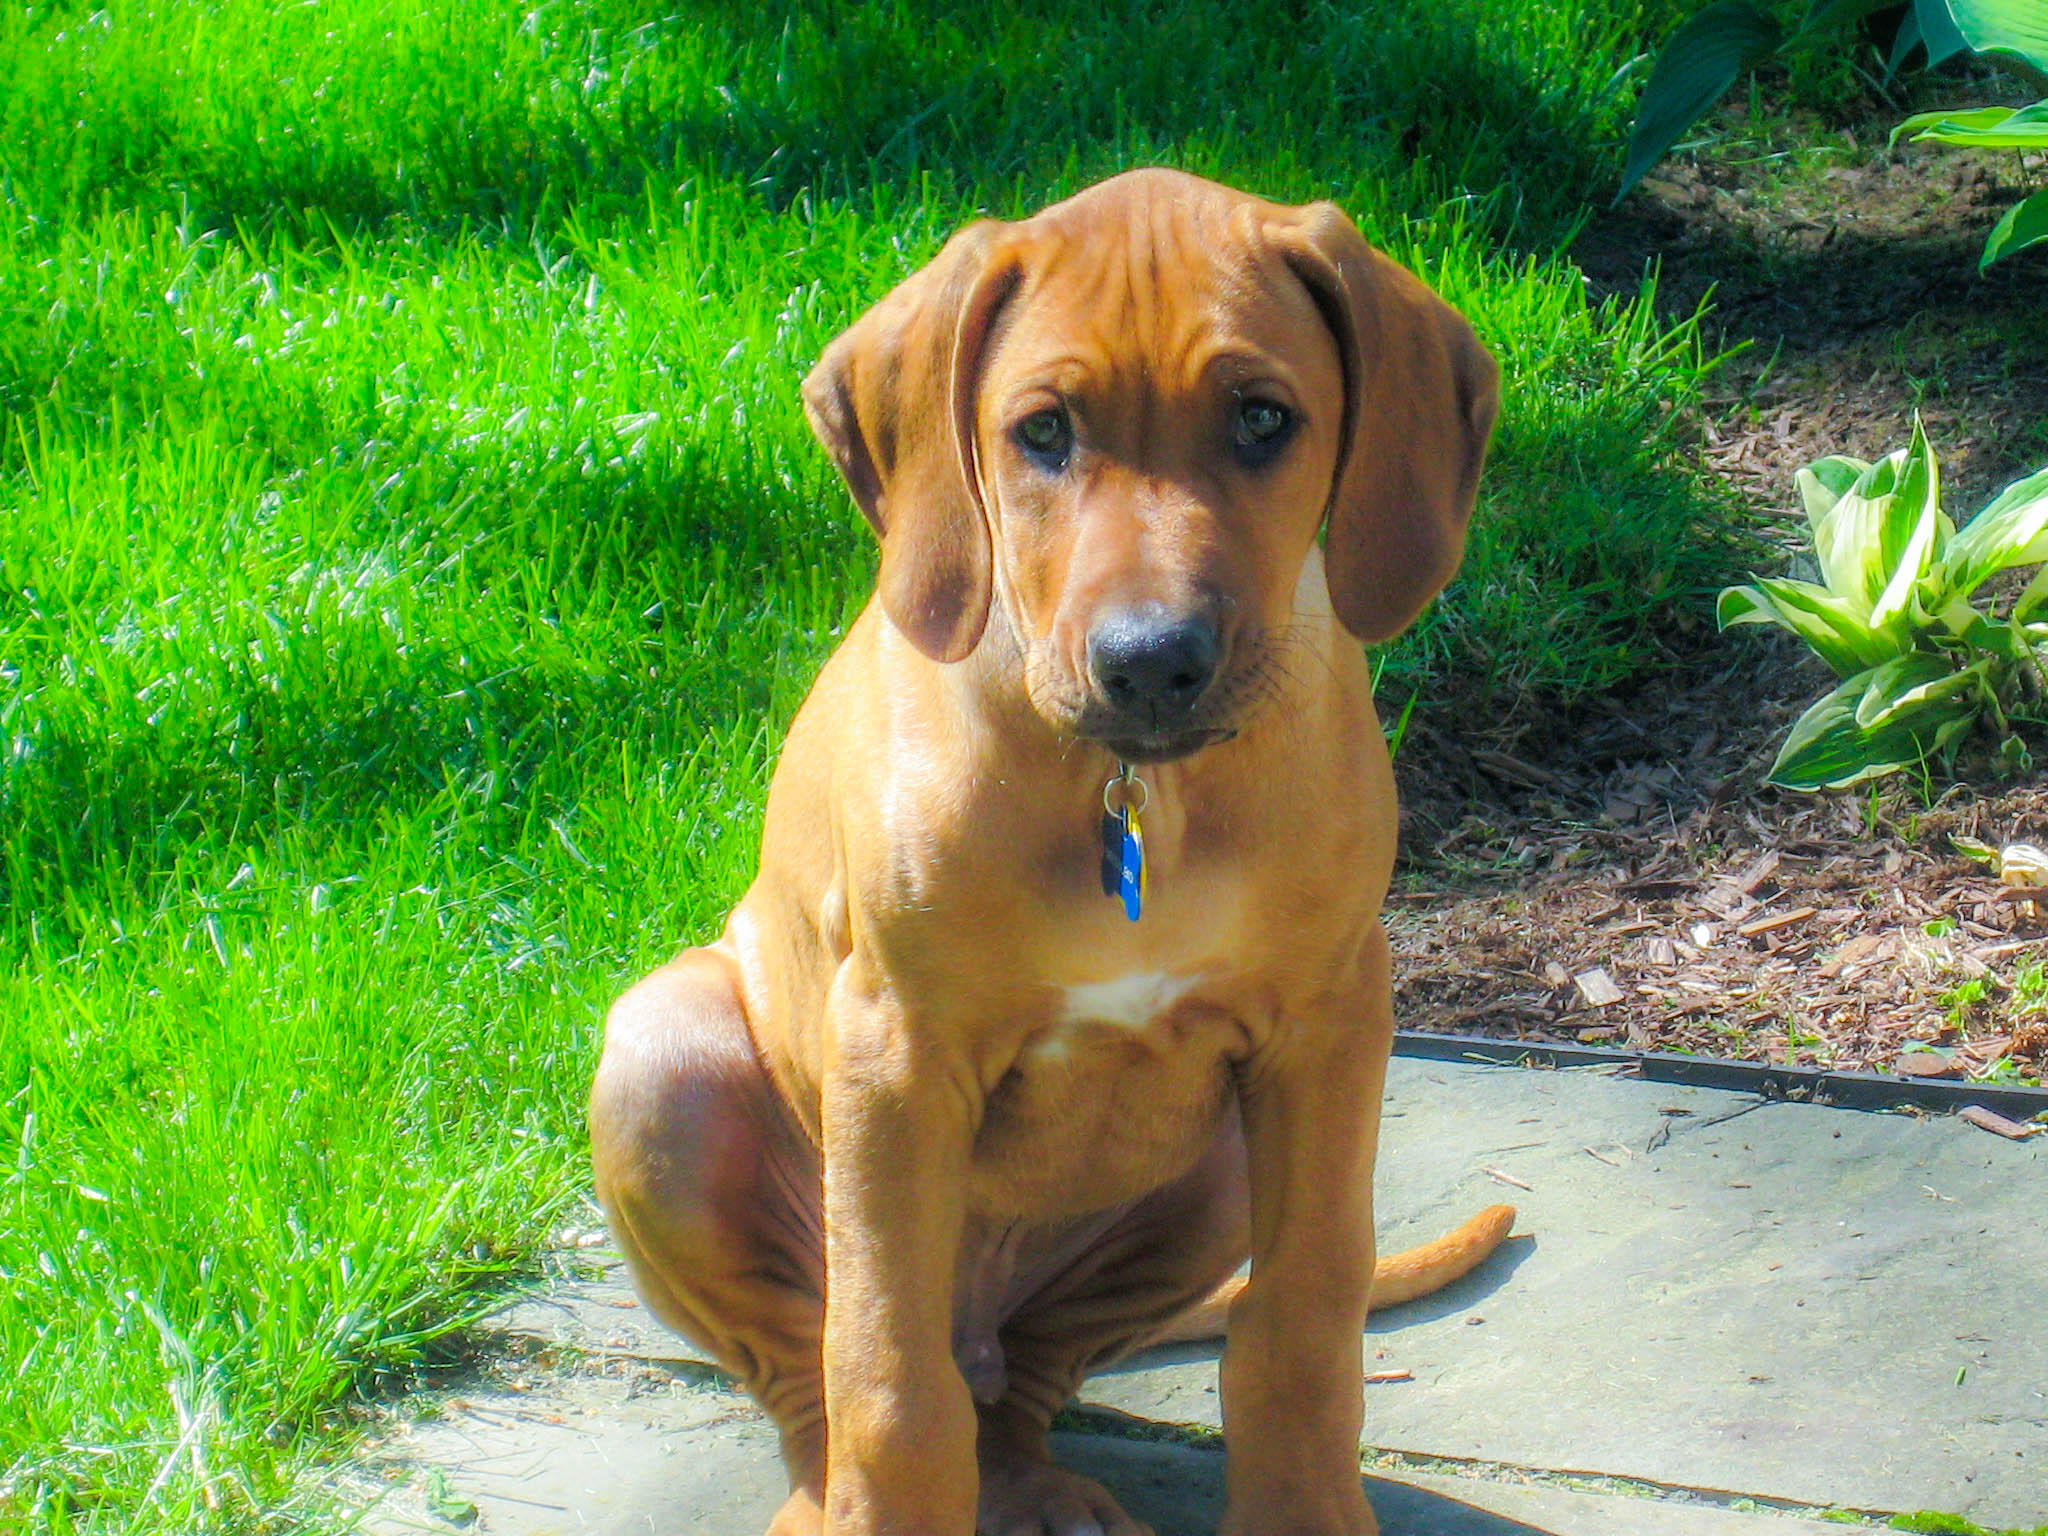 Rhodesian Ridgeback, Rhodesian Ridgeback puppy, Rhodesian Ridgeback photo, dog adventure, dog blog